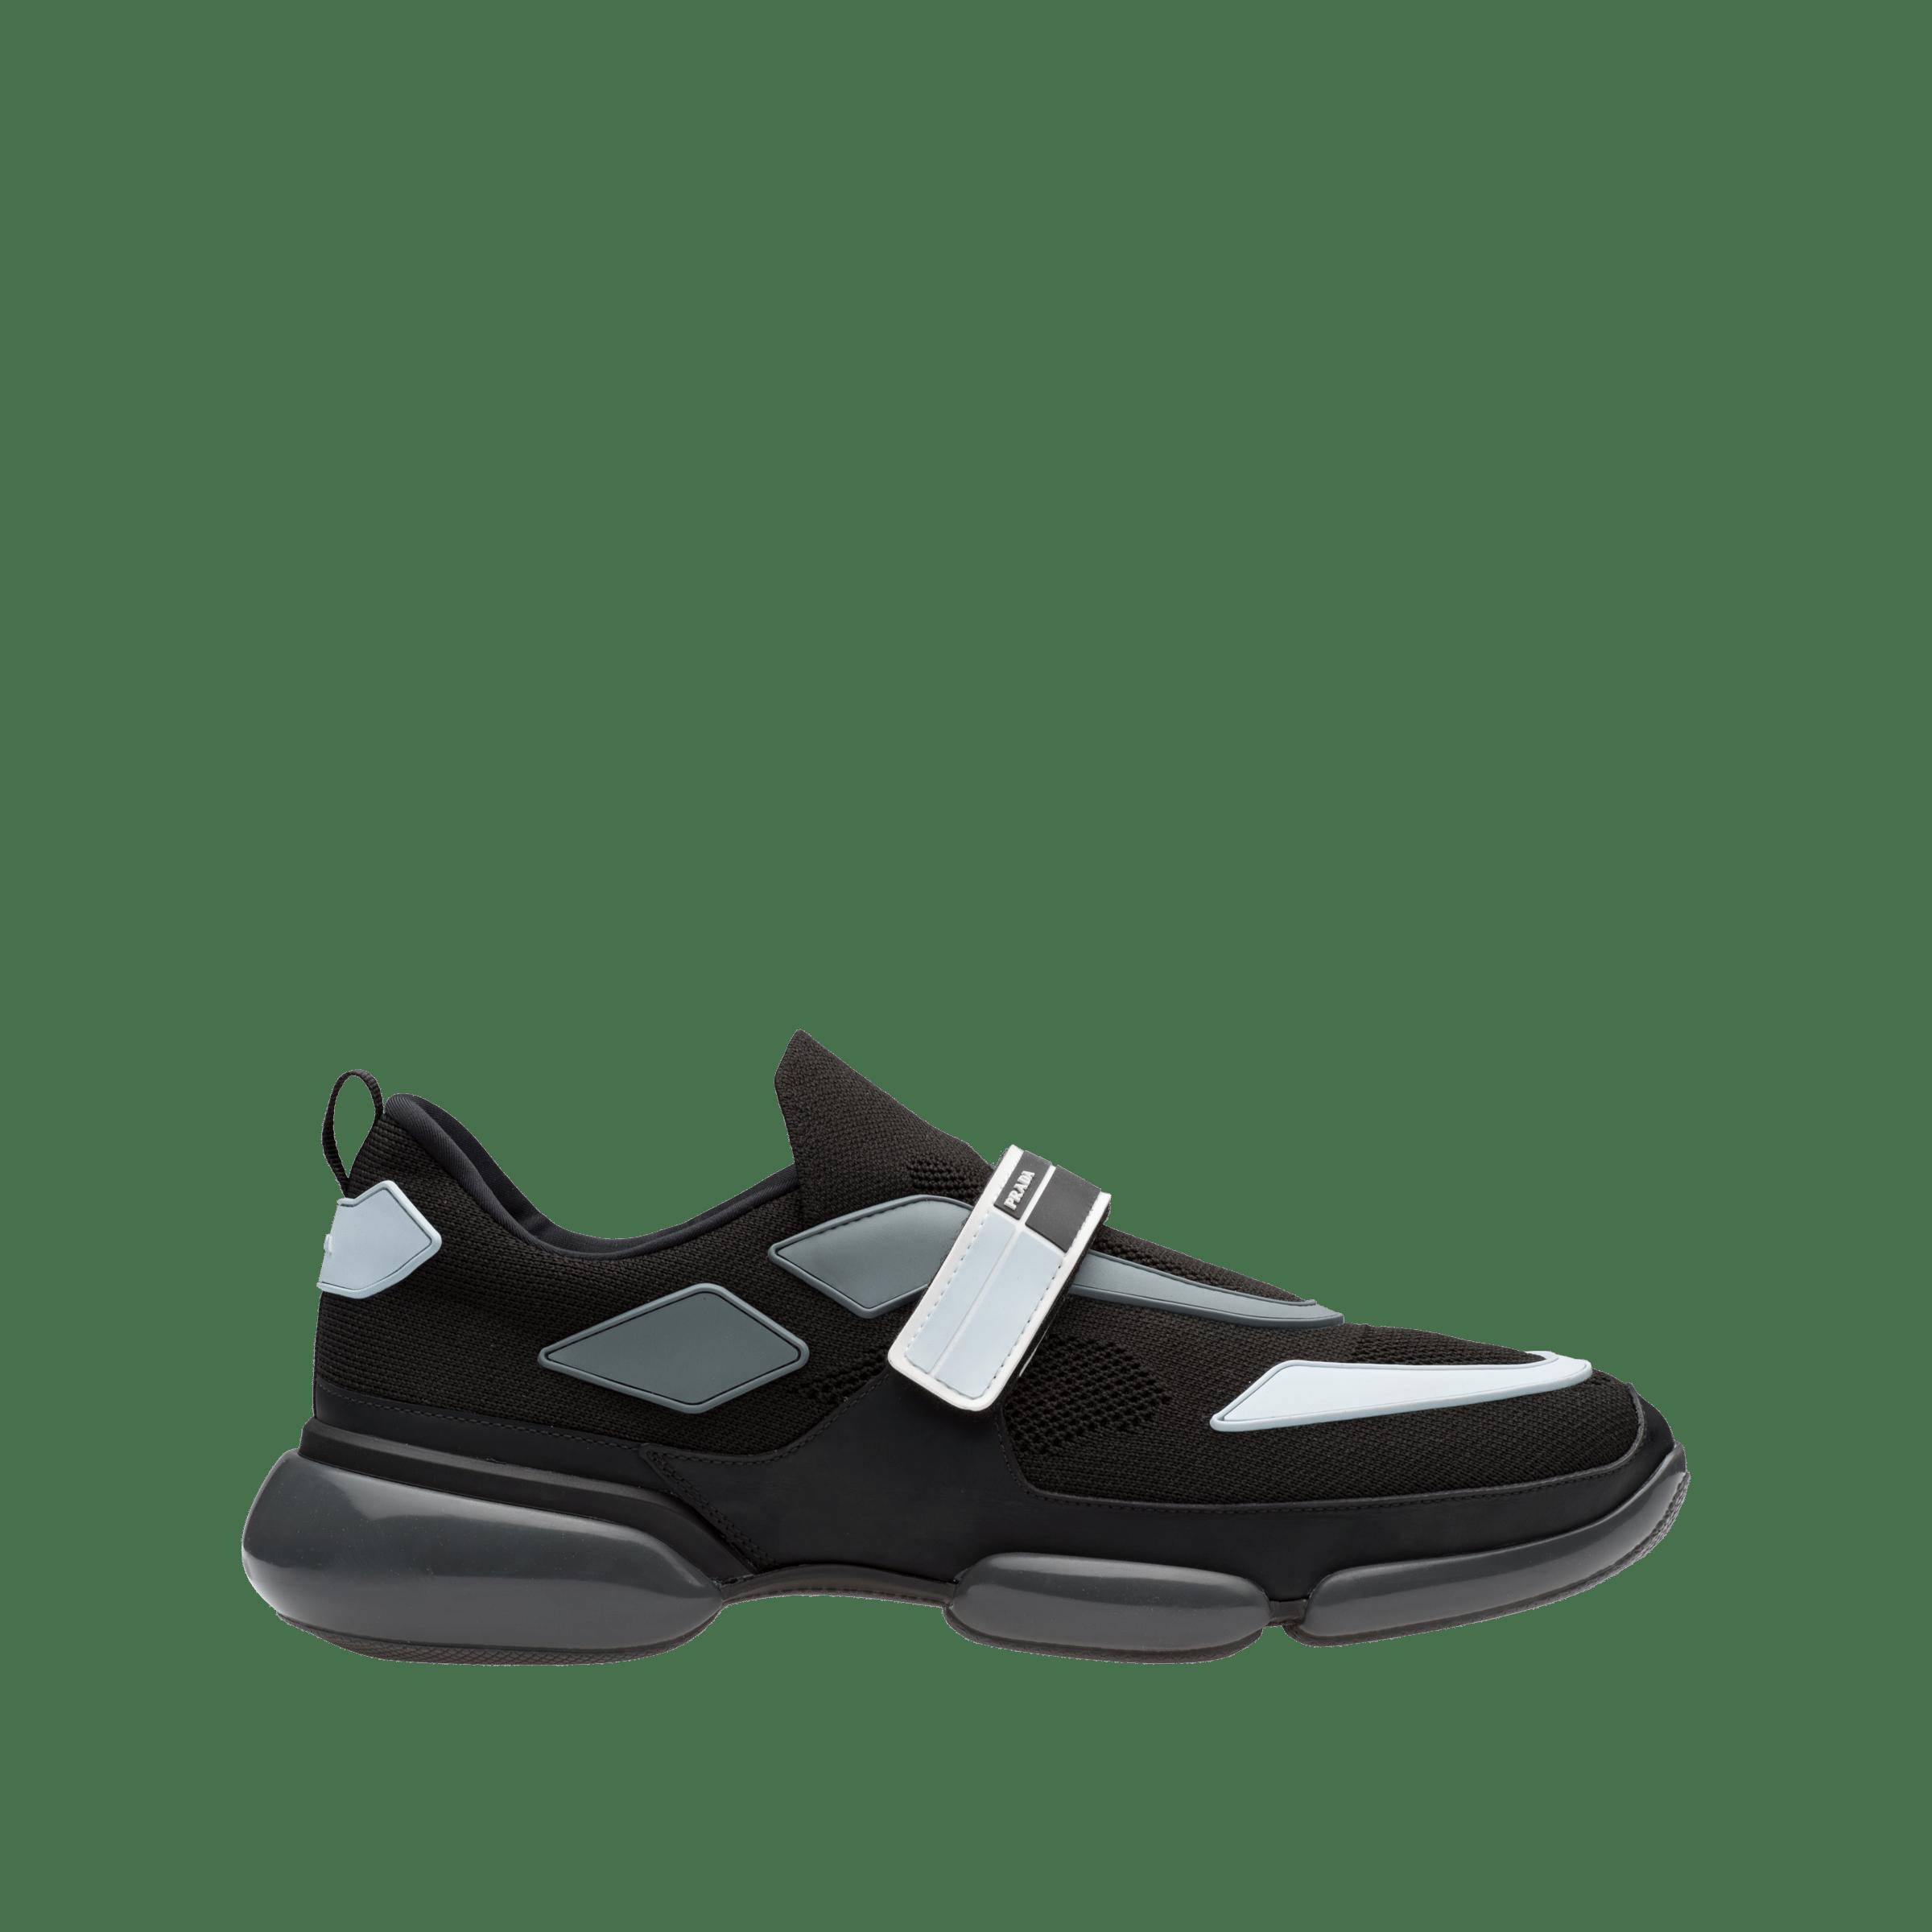 Cloudbust sneakers BLACK+ CLOUDY GRAY Prada